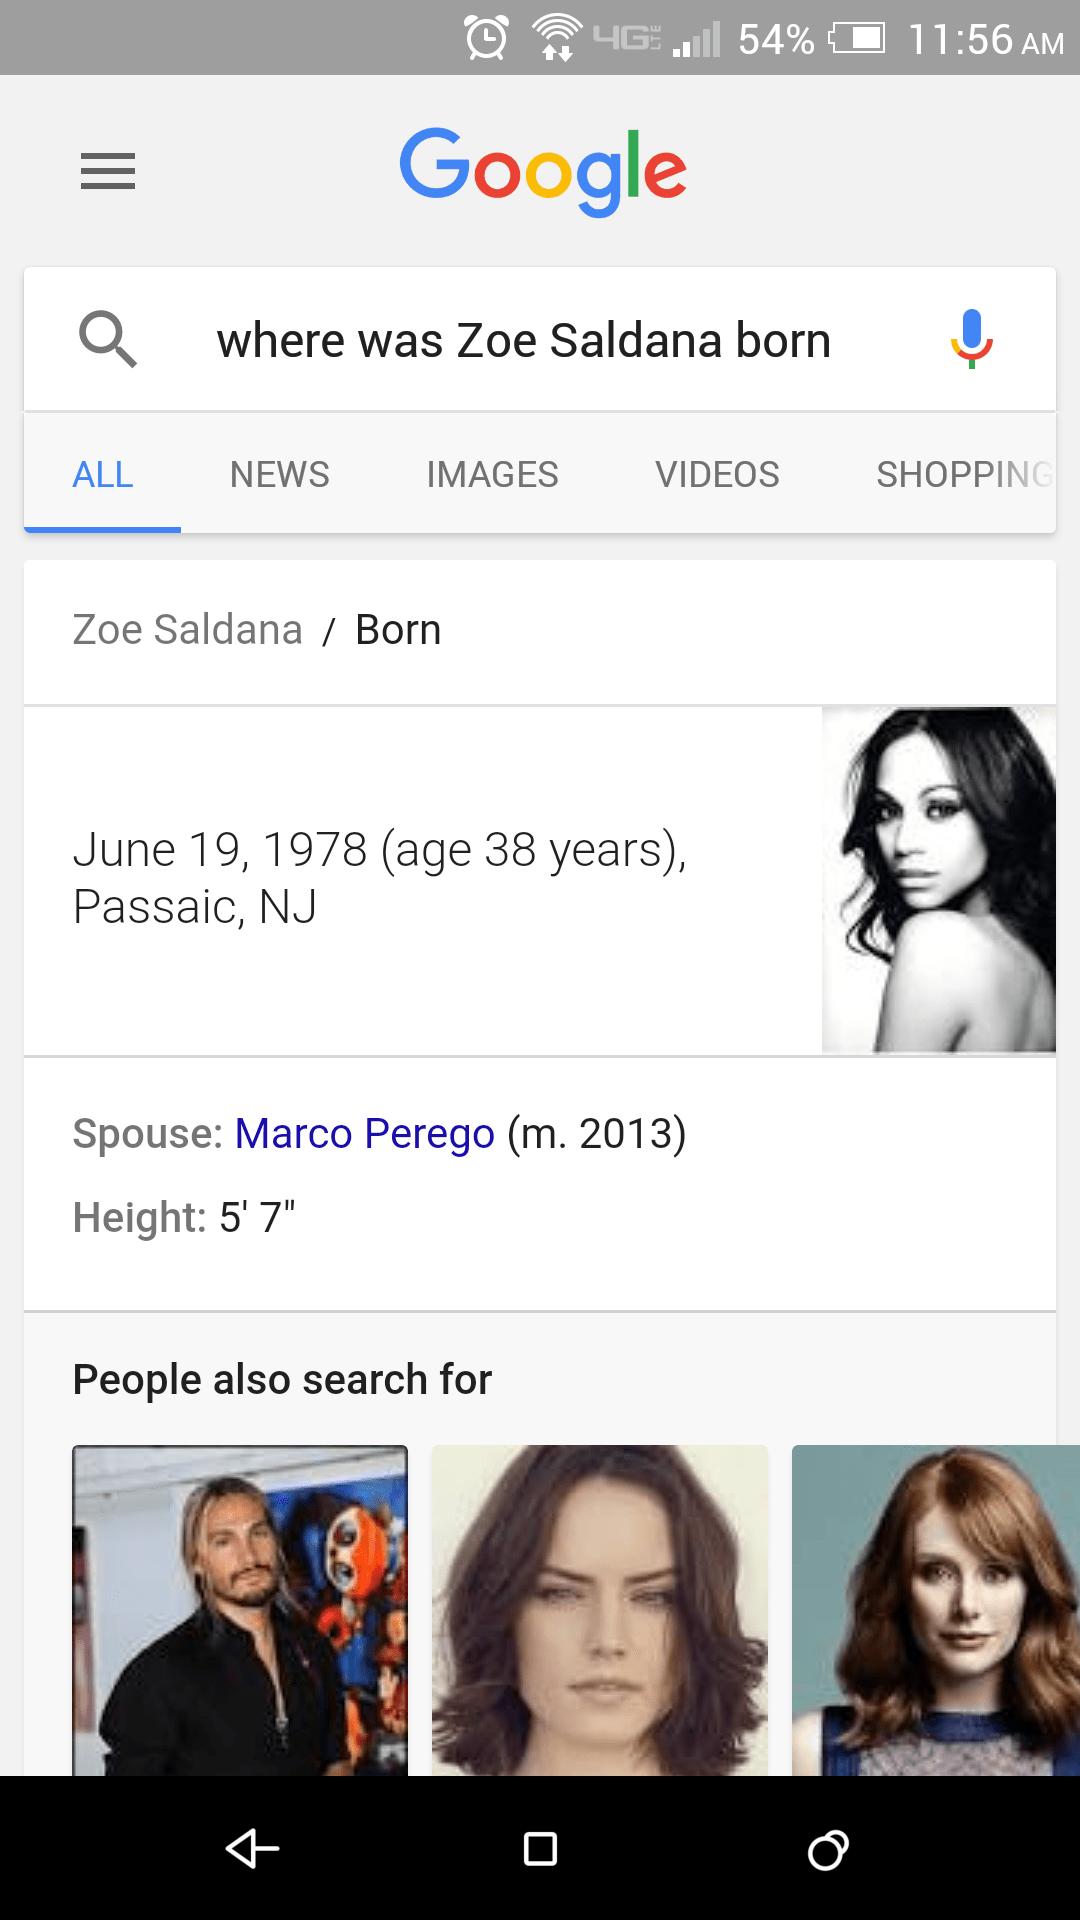 Google Voice Search Zoe Saldana birthplace query